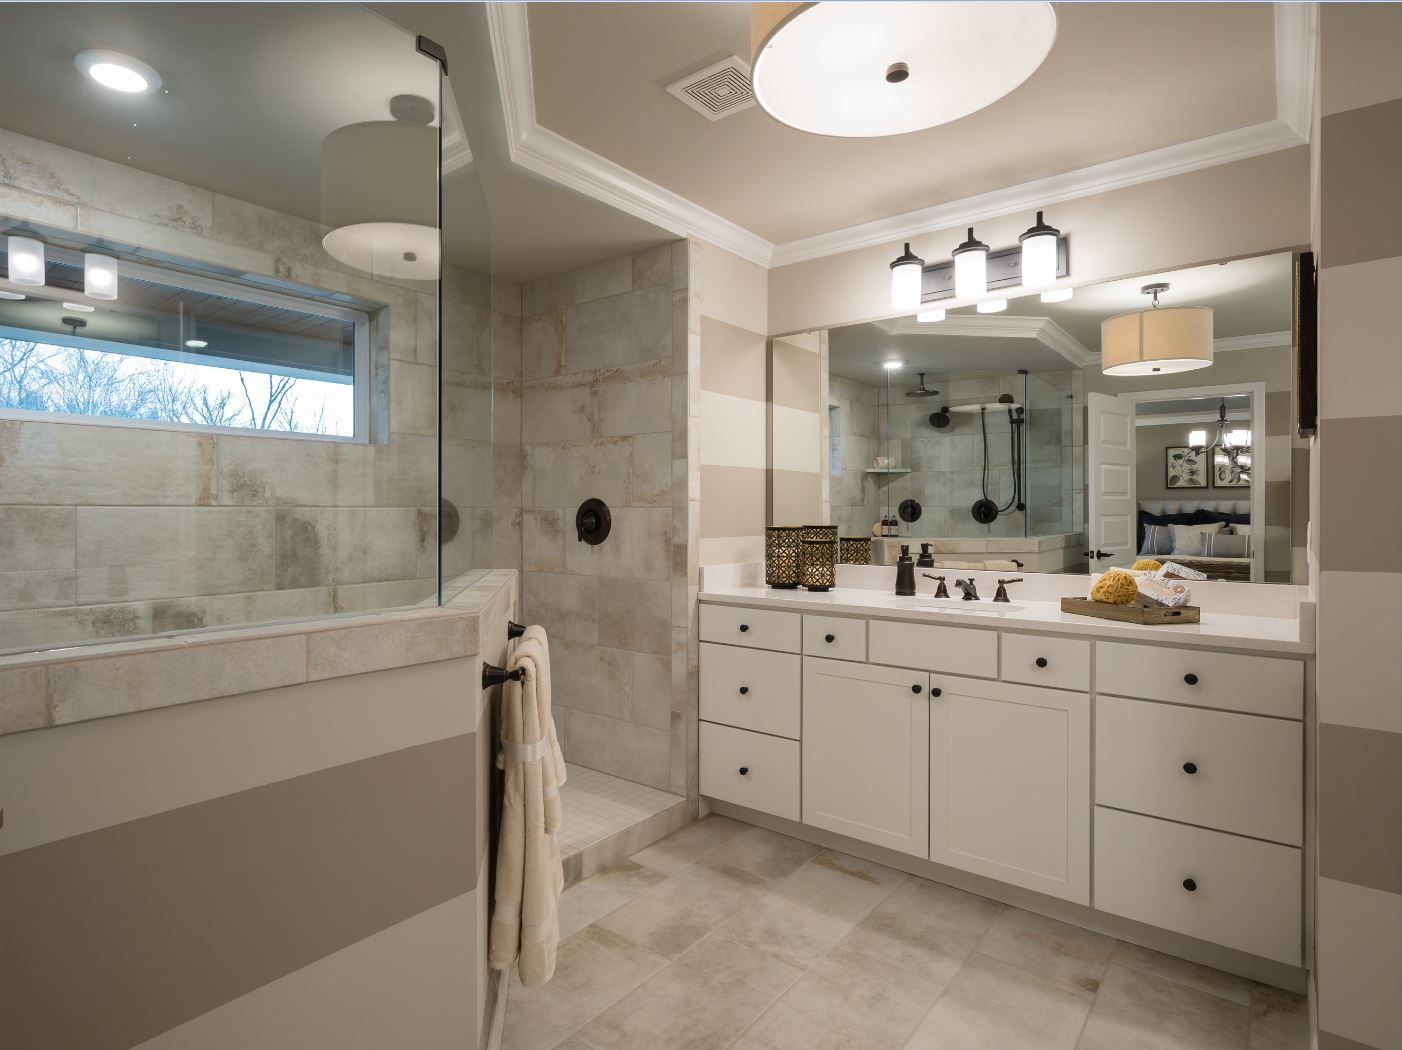 Cotto Contempo Pennsylvania Avenue Cc12 12x24 Floor And Wall Tile Dream Bathroom Flooring New Homes